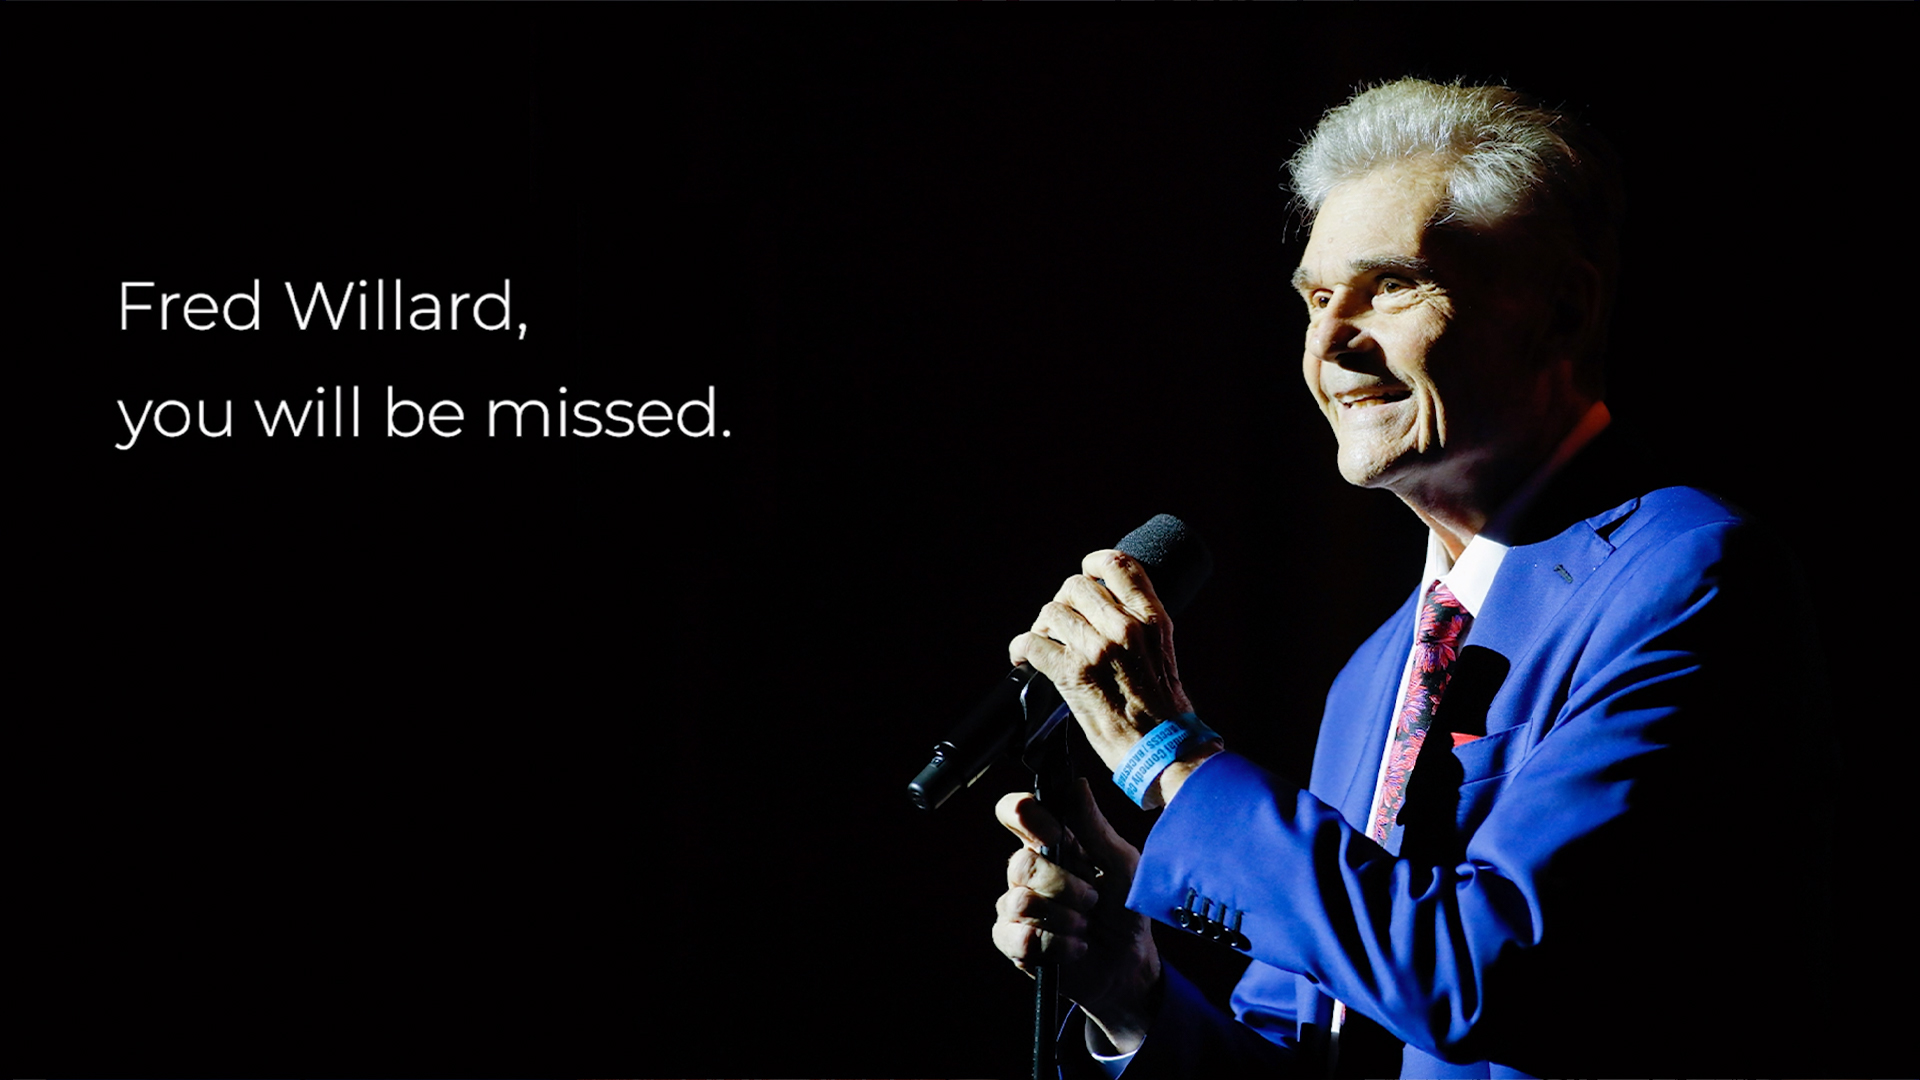 Comedian Fred Willard holds microphone